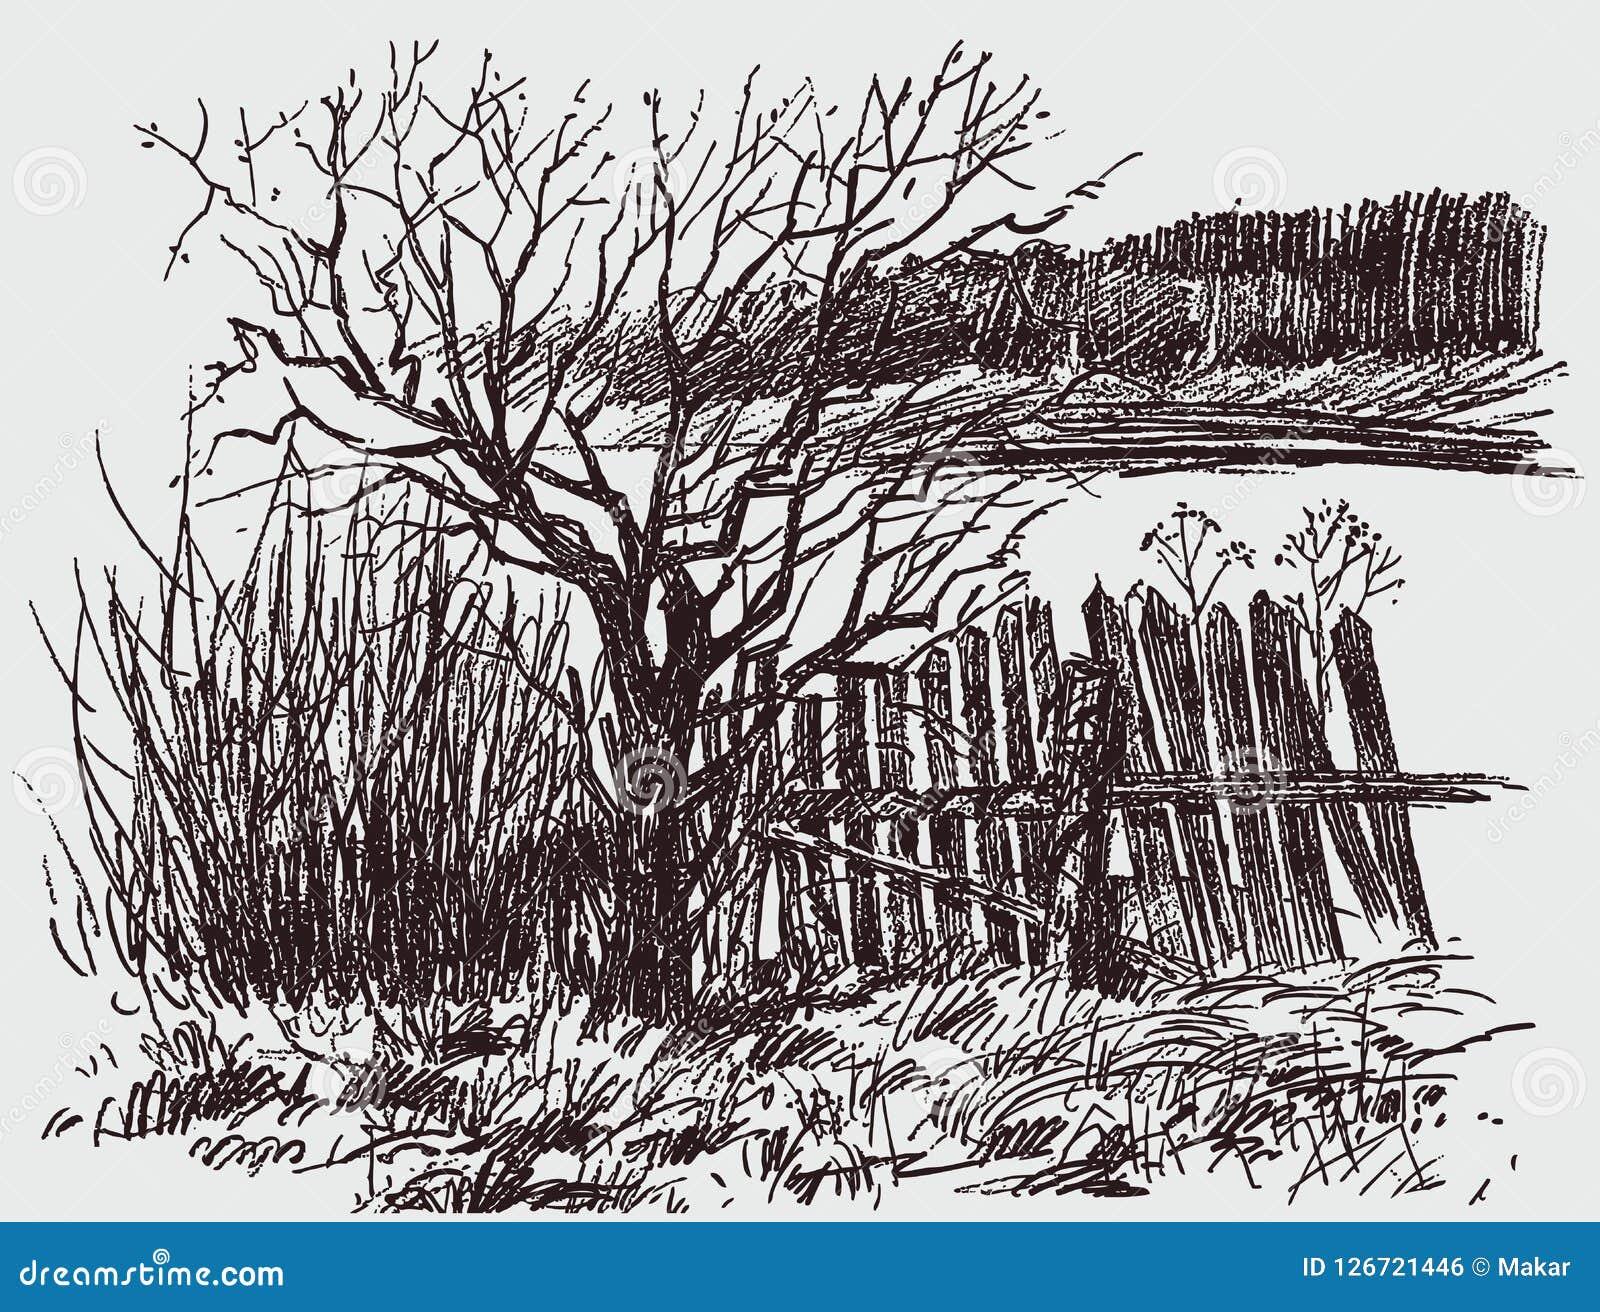 Pencil sketch of a rural landscape in spring